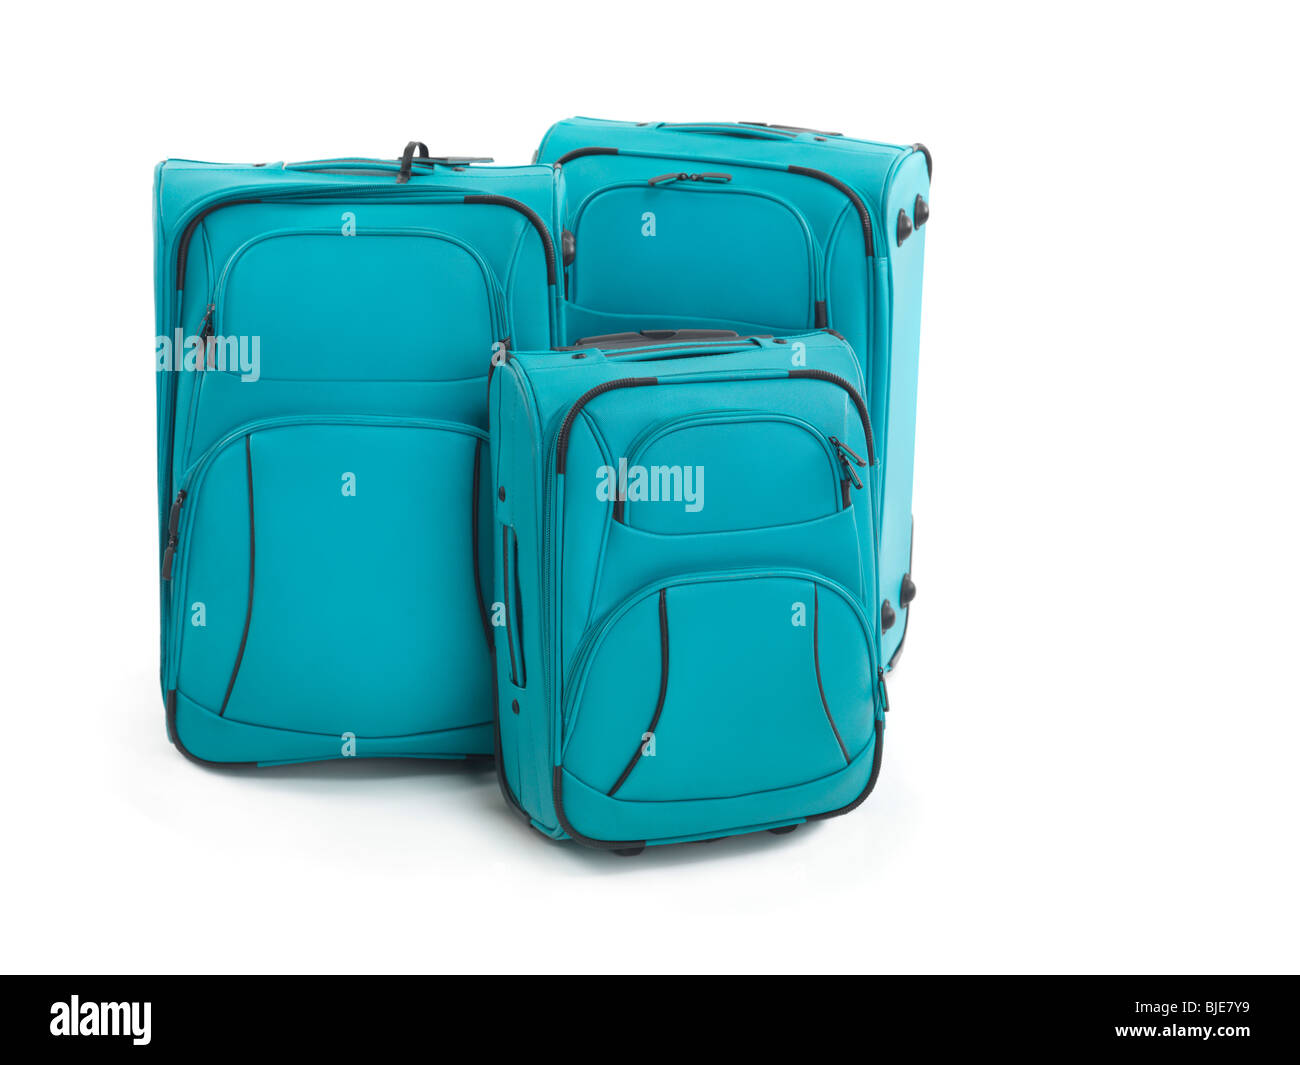 Three blue suitcases isolated on white background - Stock Image